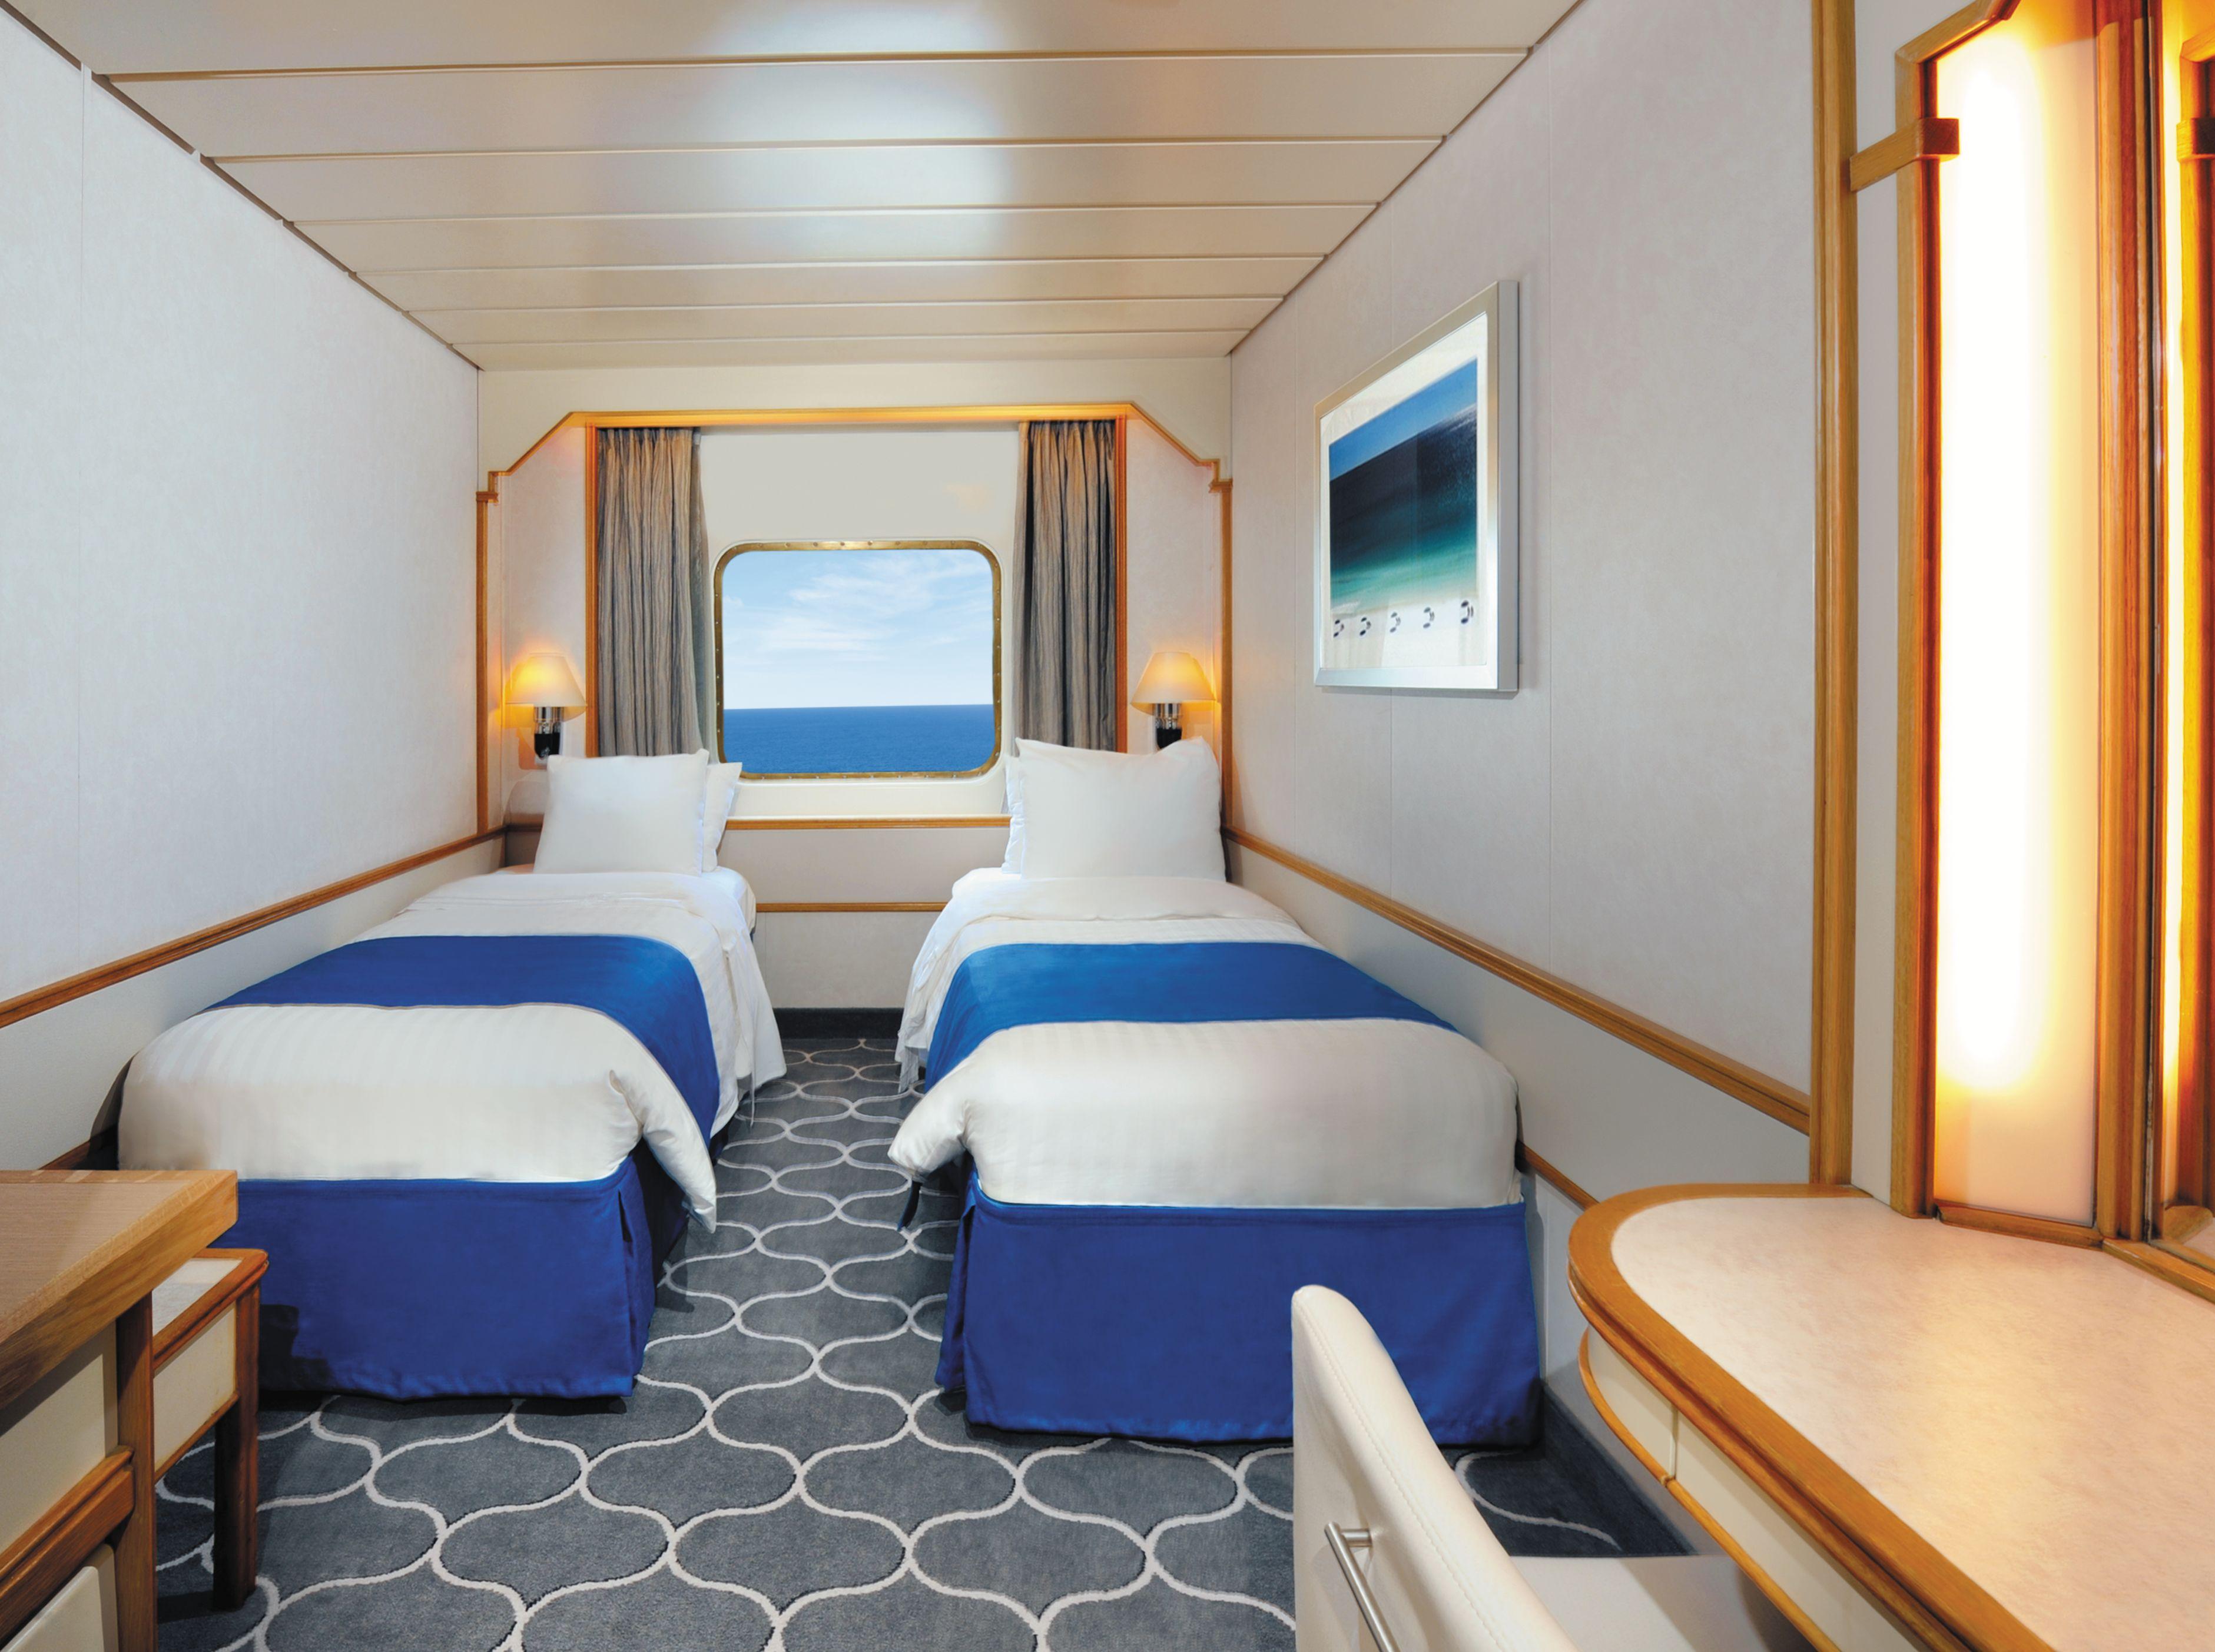 Deck Deck 3 Of The Ship Empress Of The Seas Royal Caribbean Logitravel Co Uk